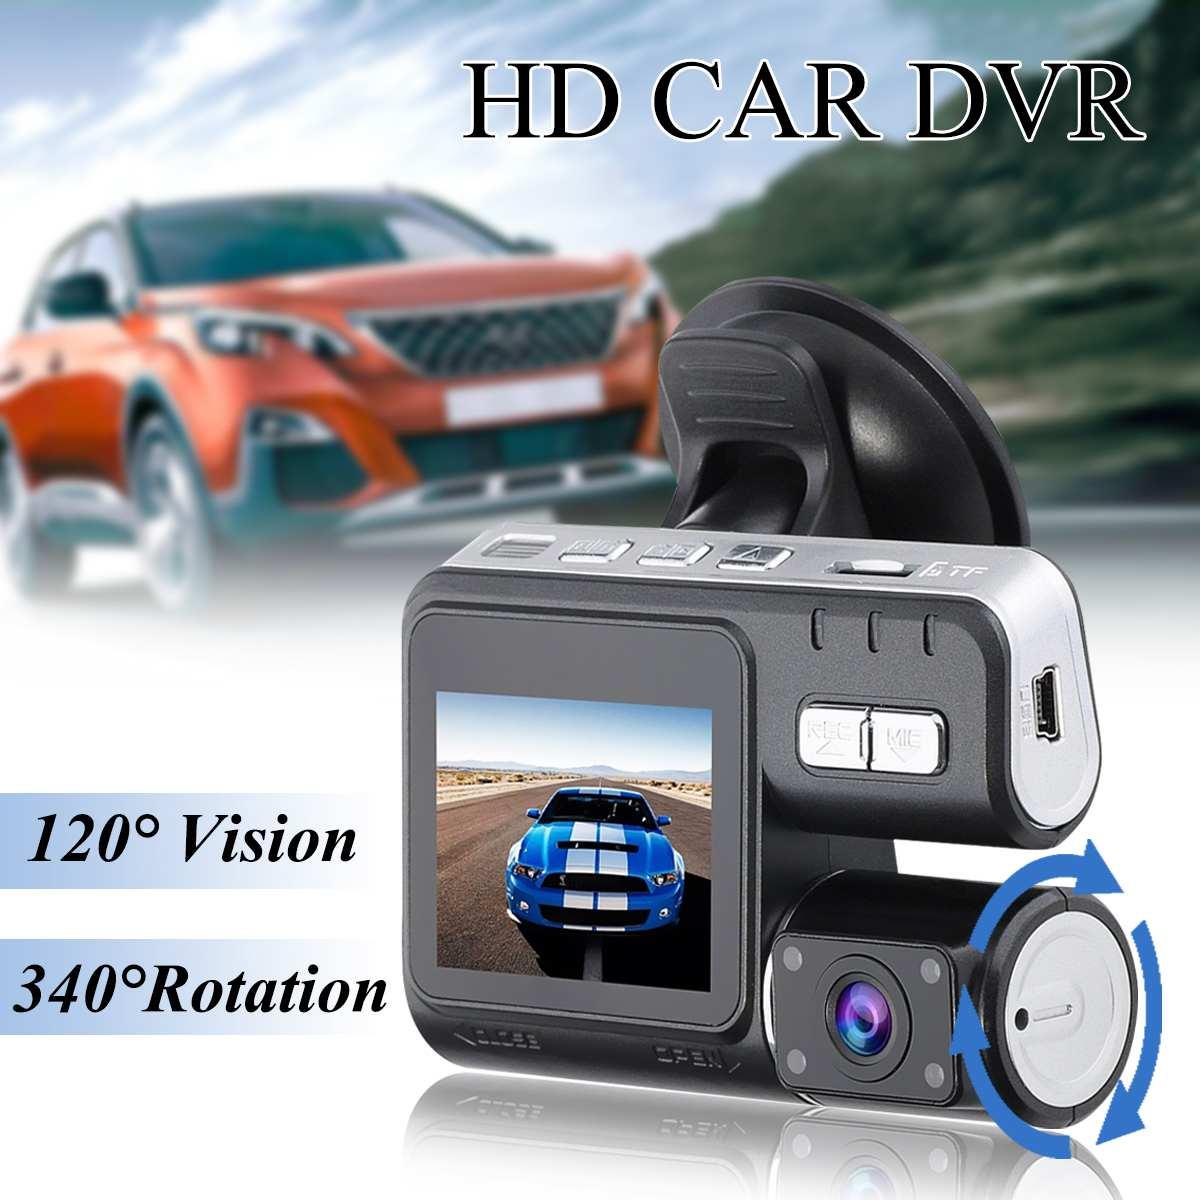 Car DVR Camera Dash-Cam Video Front-Recorder G-Sensor-Up Night-Vision 120-Degree TFT